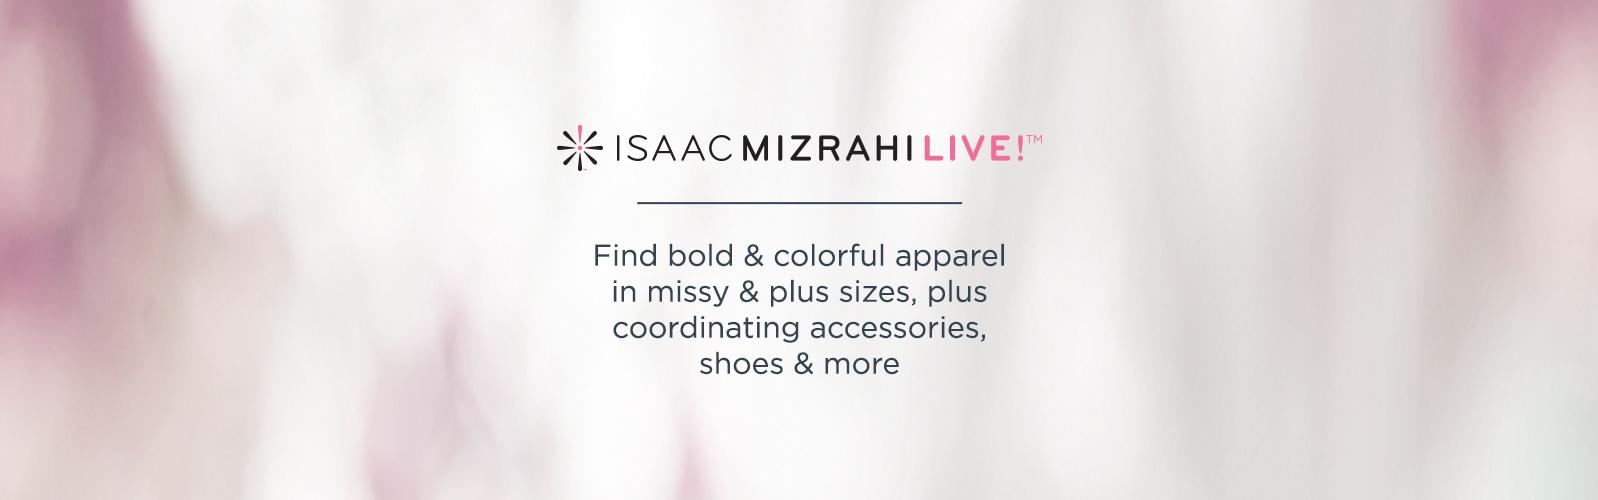 775e160a2651 Isaac Mizrahi Live(TM) — Designer Collection — QVC.com